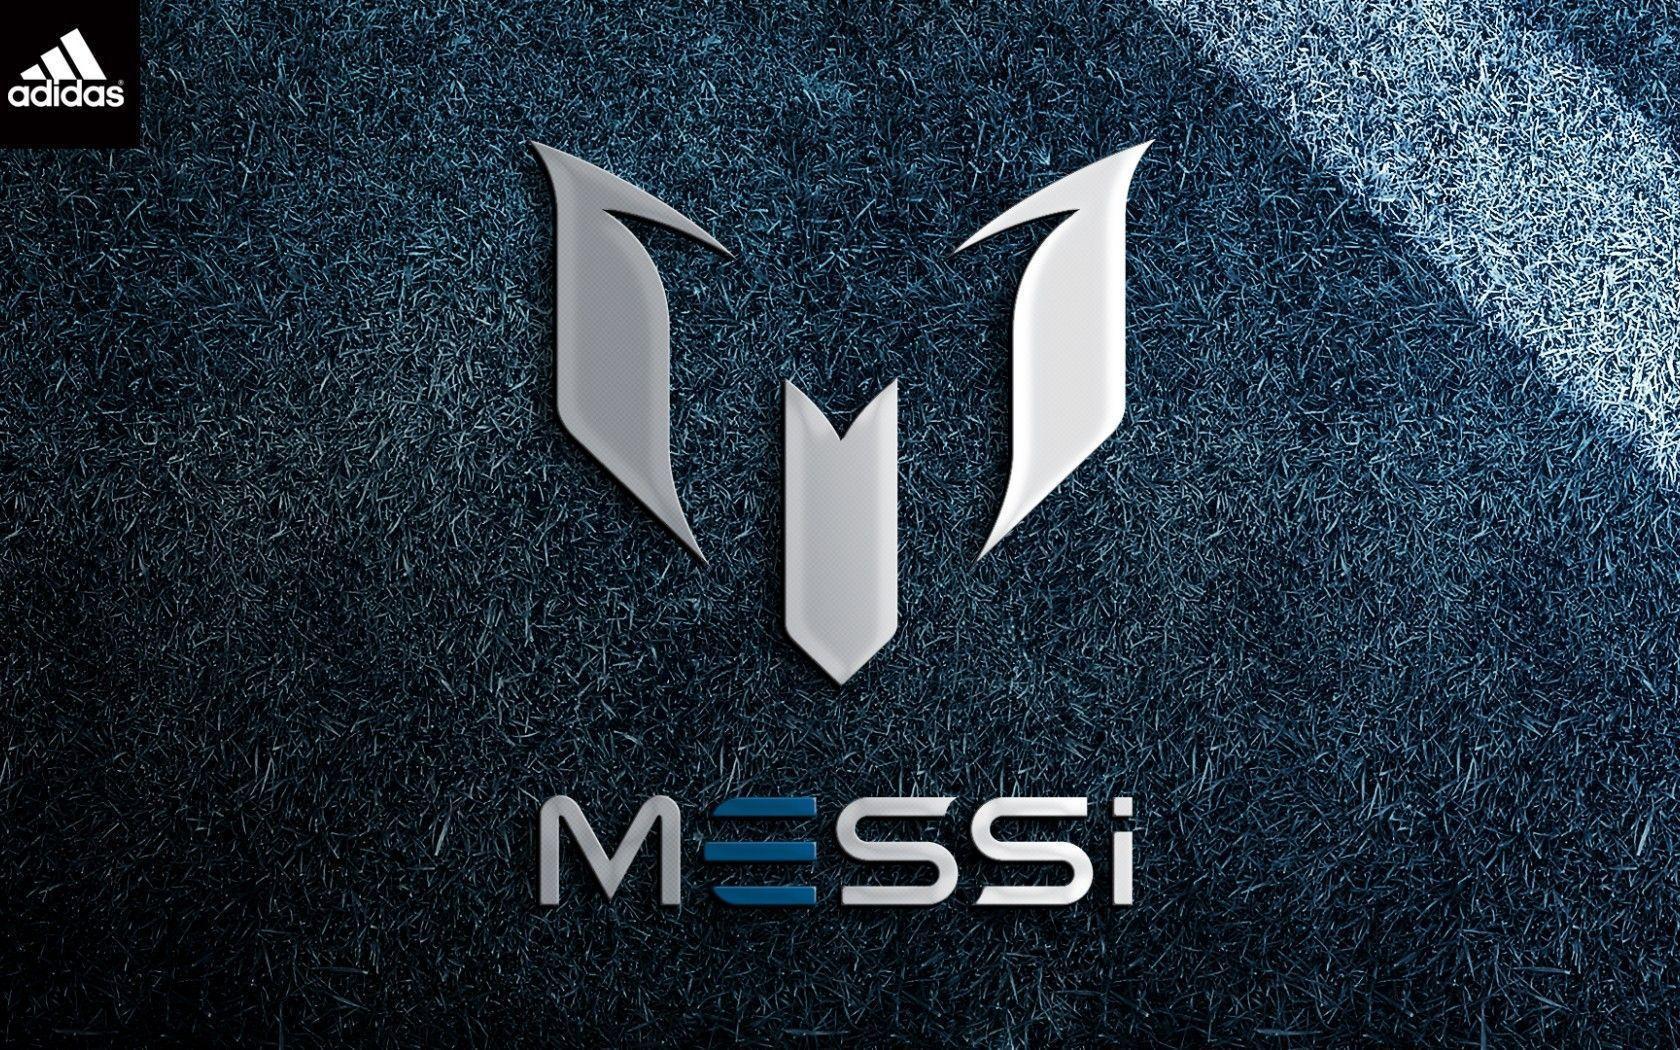 Месси обои на рабочий стол 2018 6